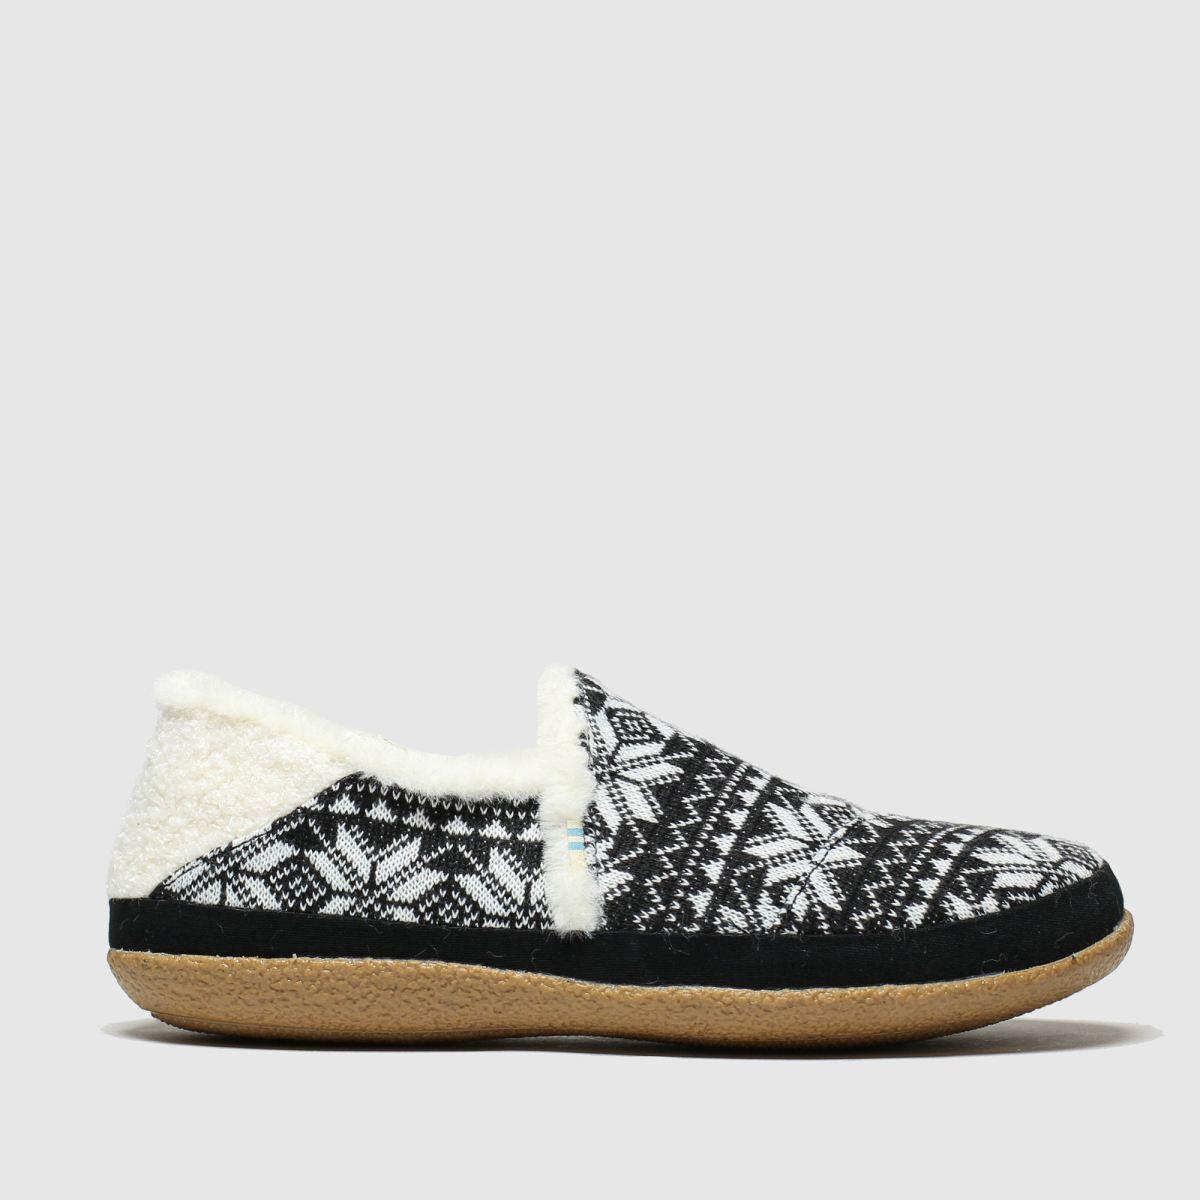 Toms Black & White India Slippers